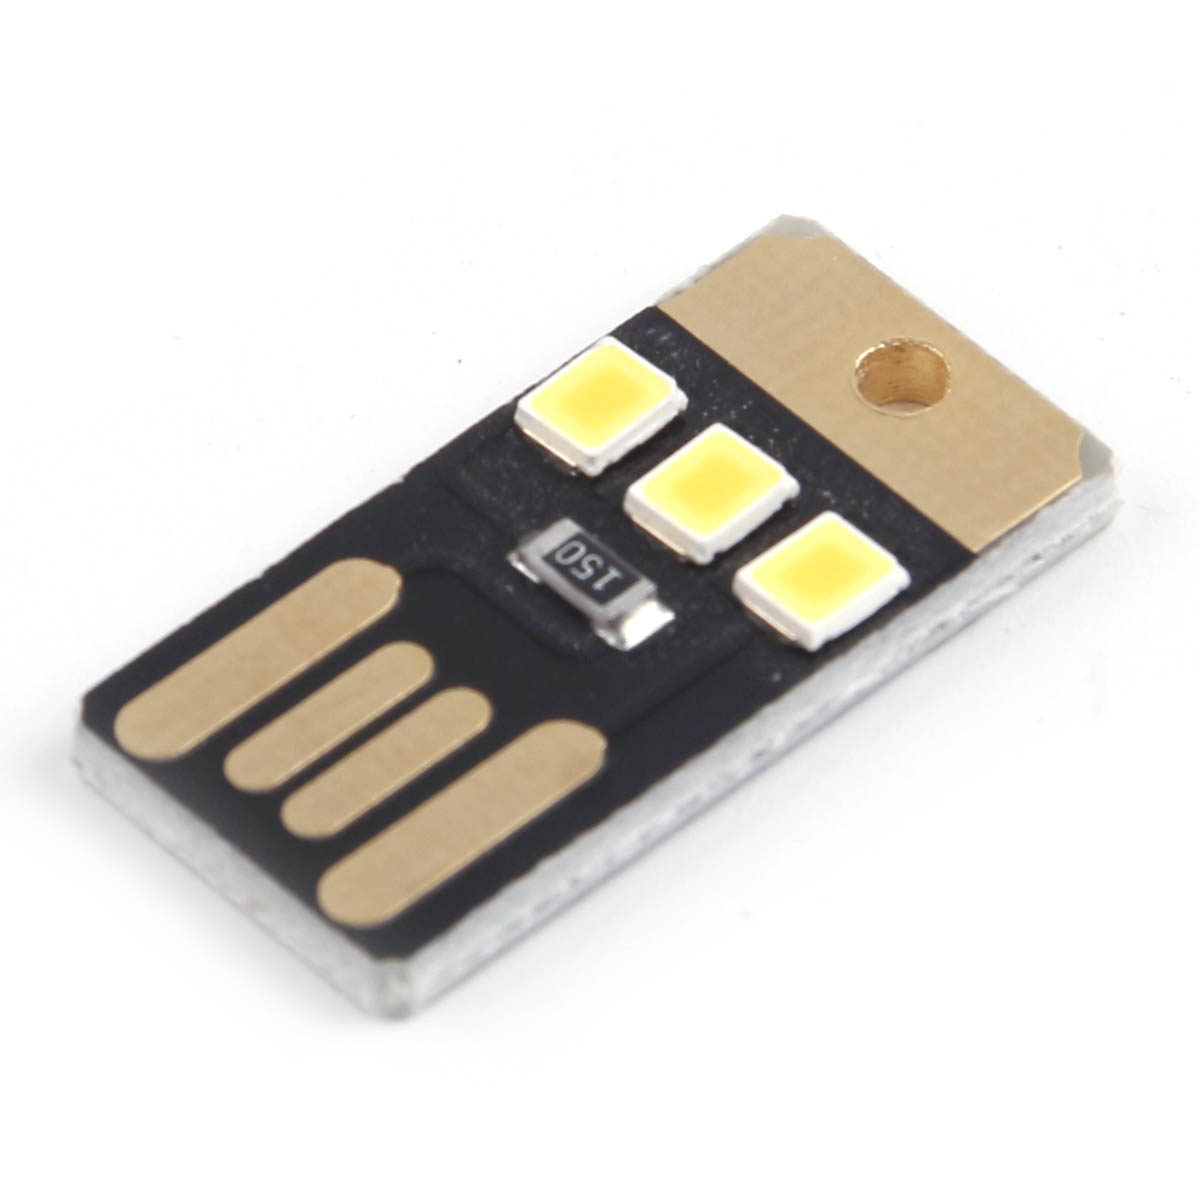 LED Night Light Pocket Card Lamp Led Keychain Lamp Portable USB Power New